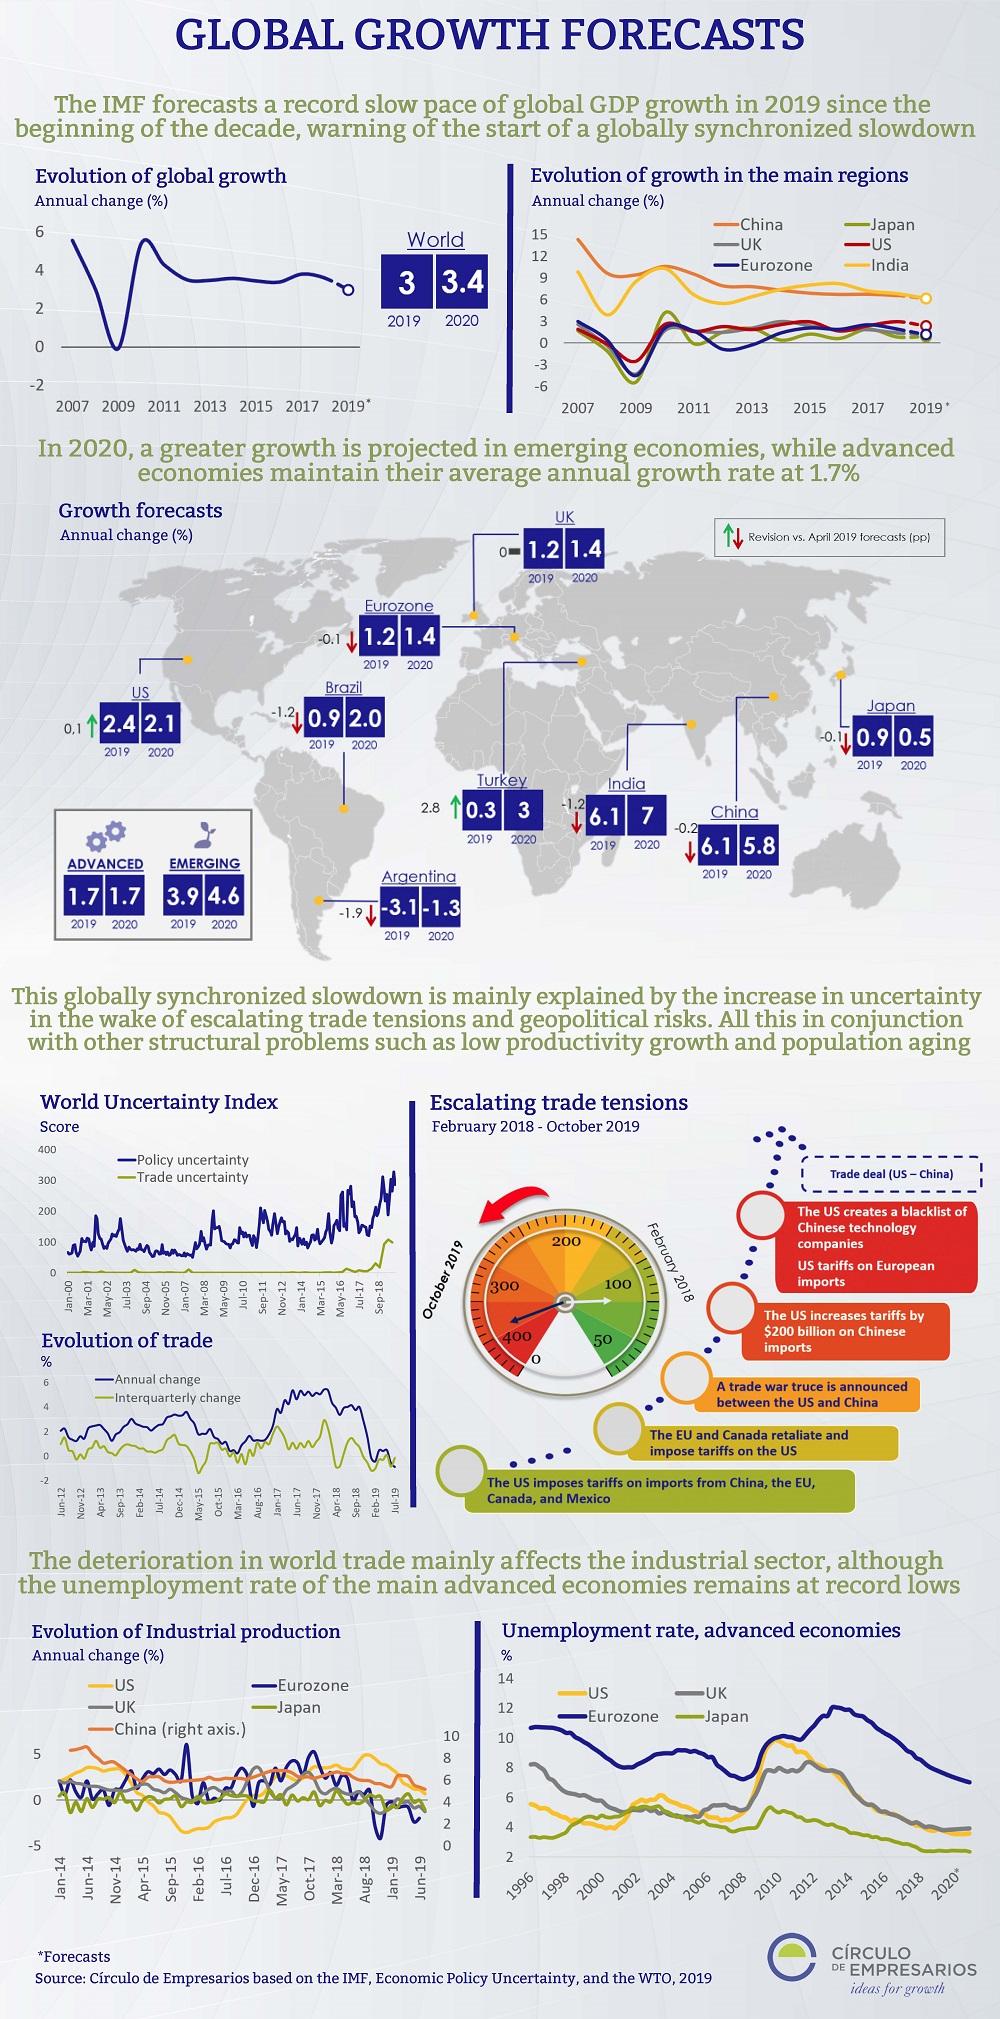 GLOBAL-GROWTH-FORECASTS-infographic-October-2019-Circulo-de-Empresarios